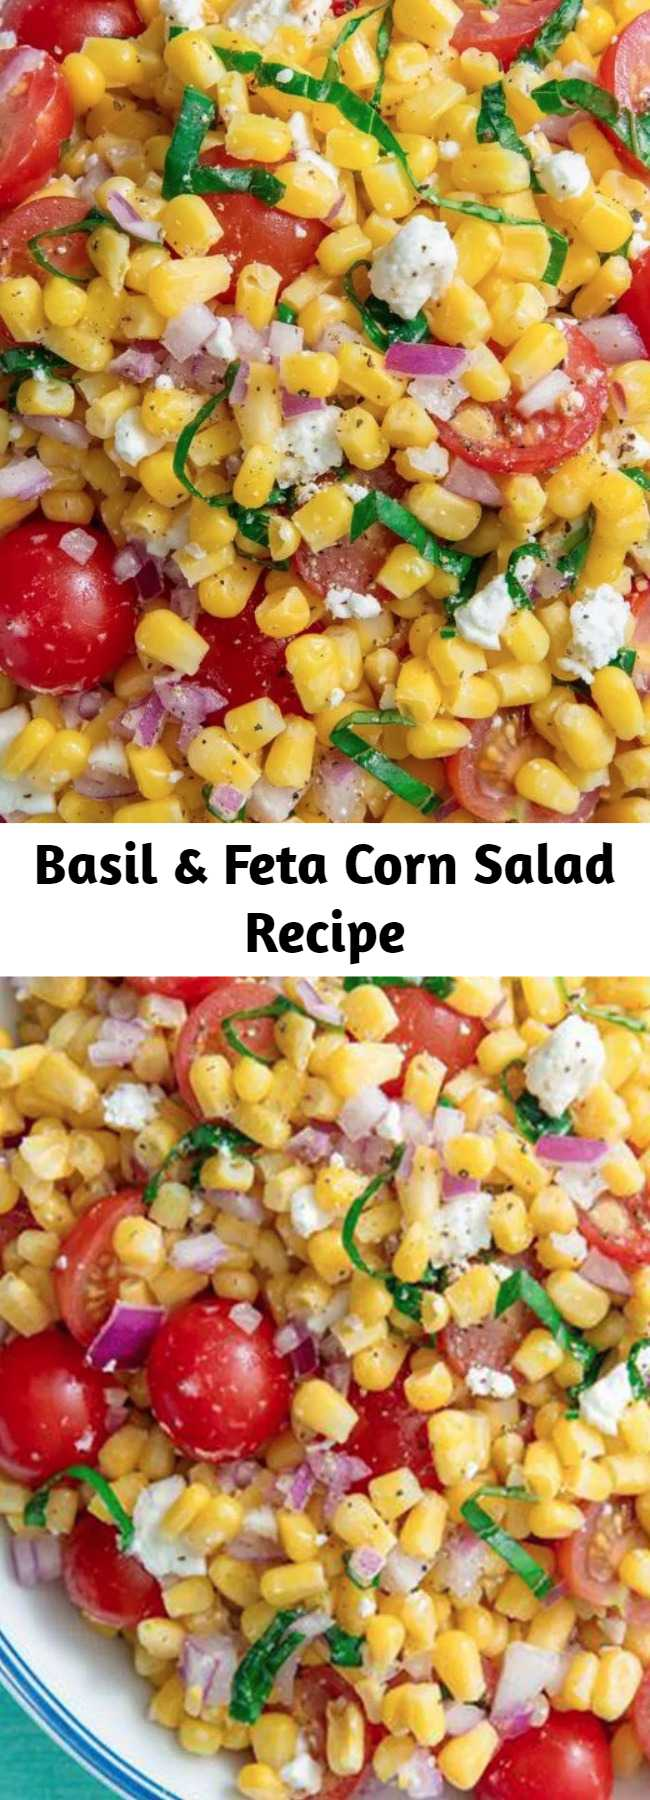 Basil & Feta Corn Salad Recipe - Corn Salad makes the perfect summer dish for picnics, potlucks, or BBQs. So easy to make with no cooking involved! #easyrecipe #corn #summer #sidedish #salad